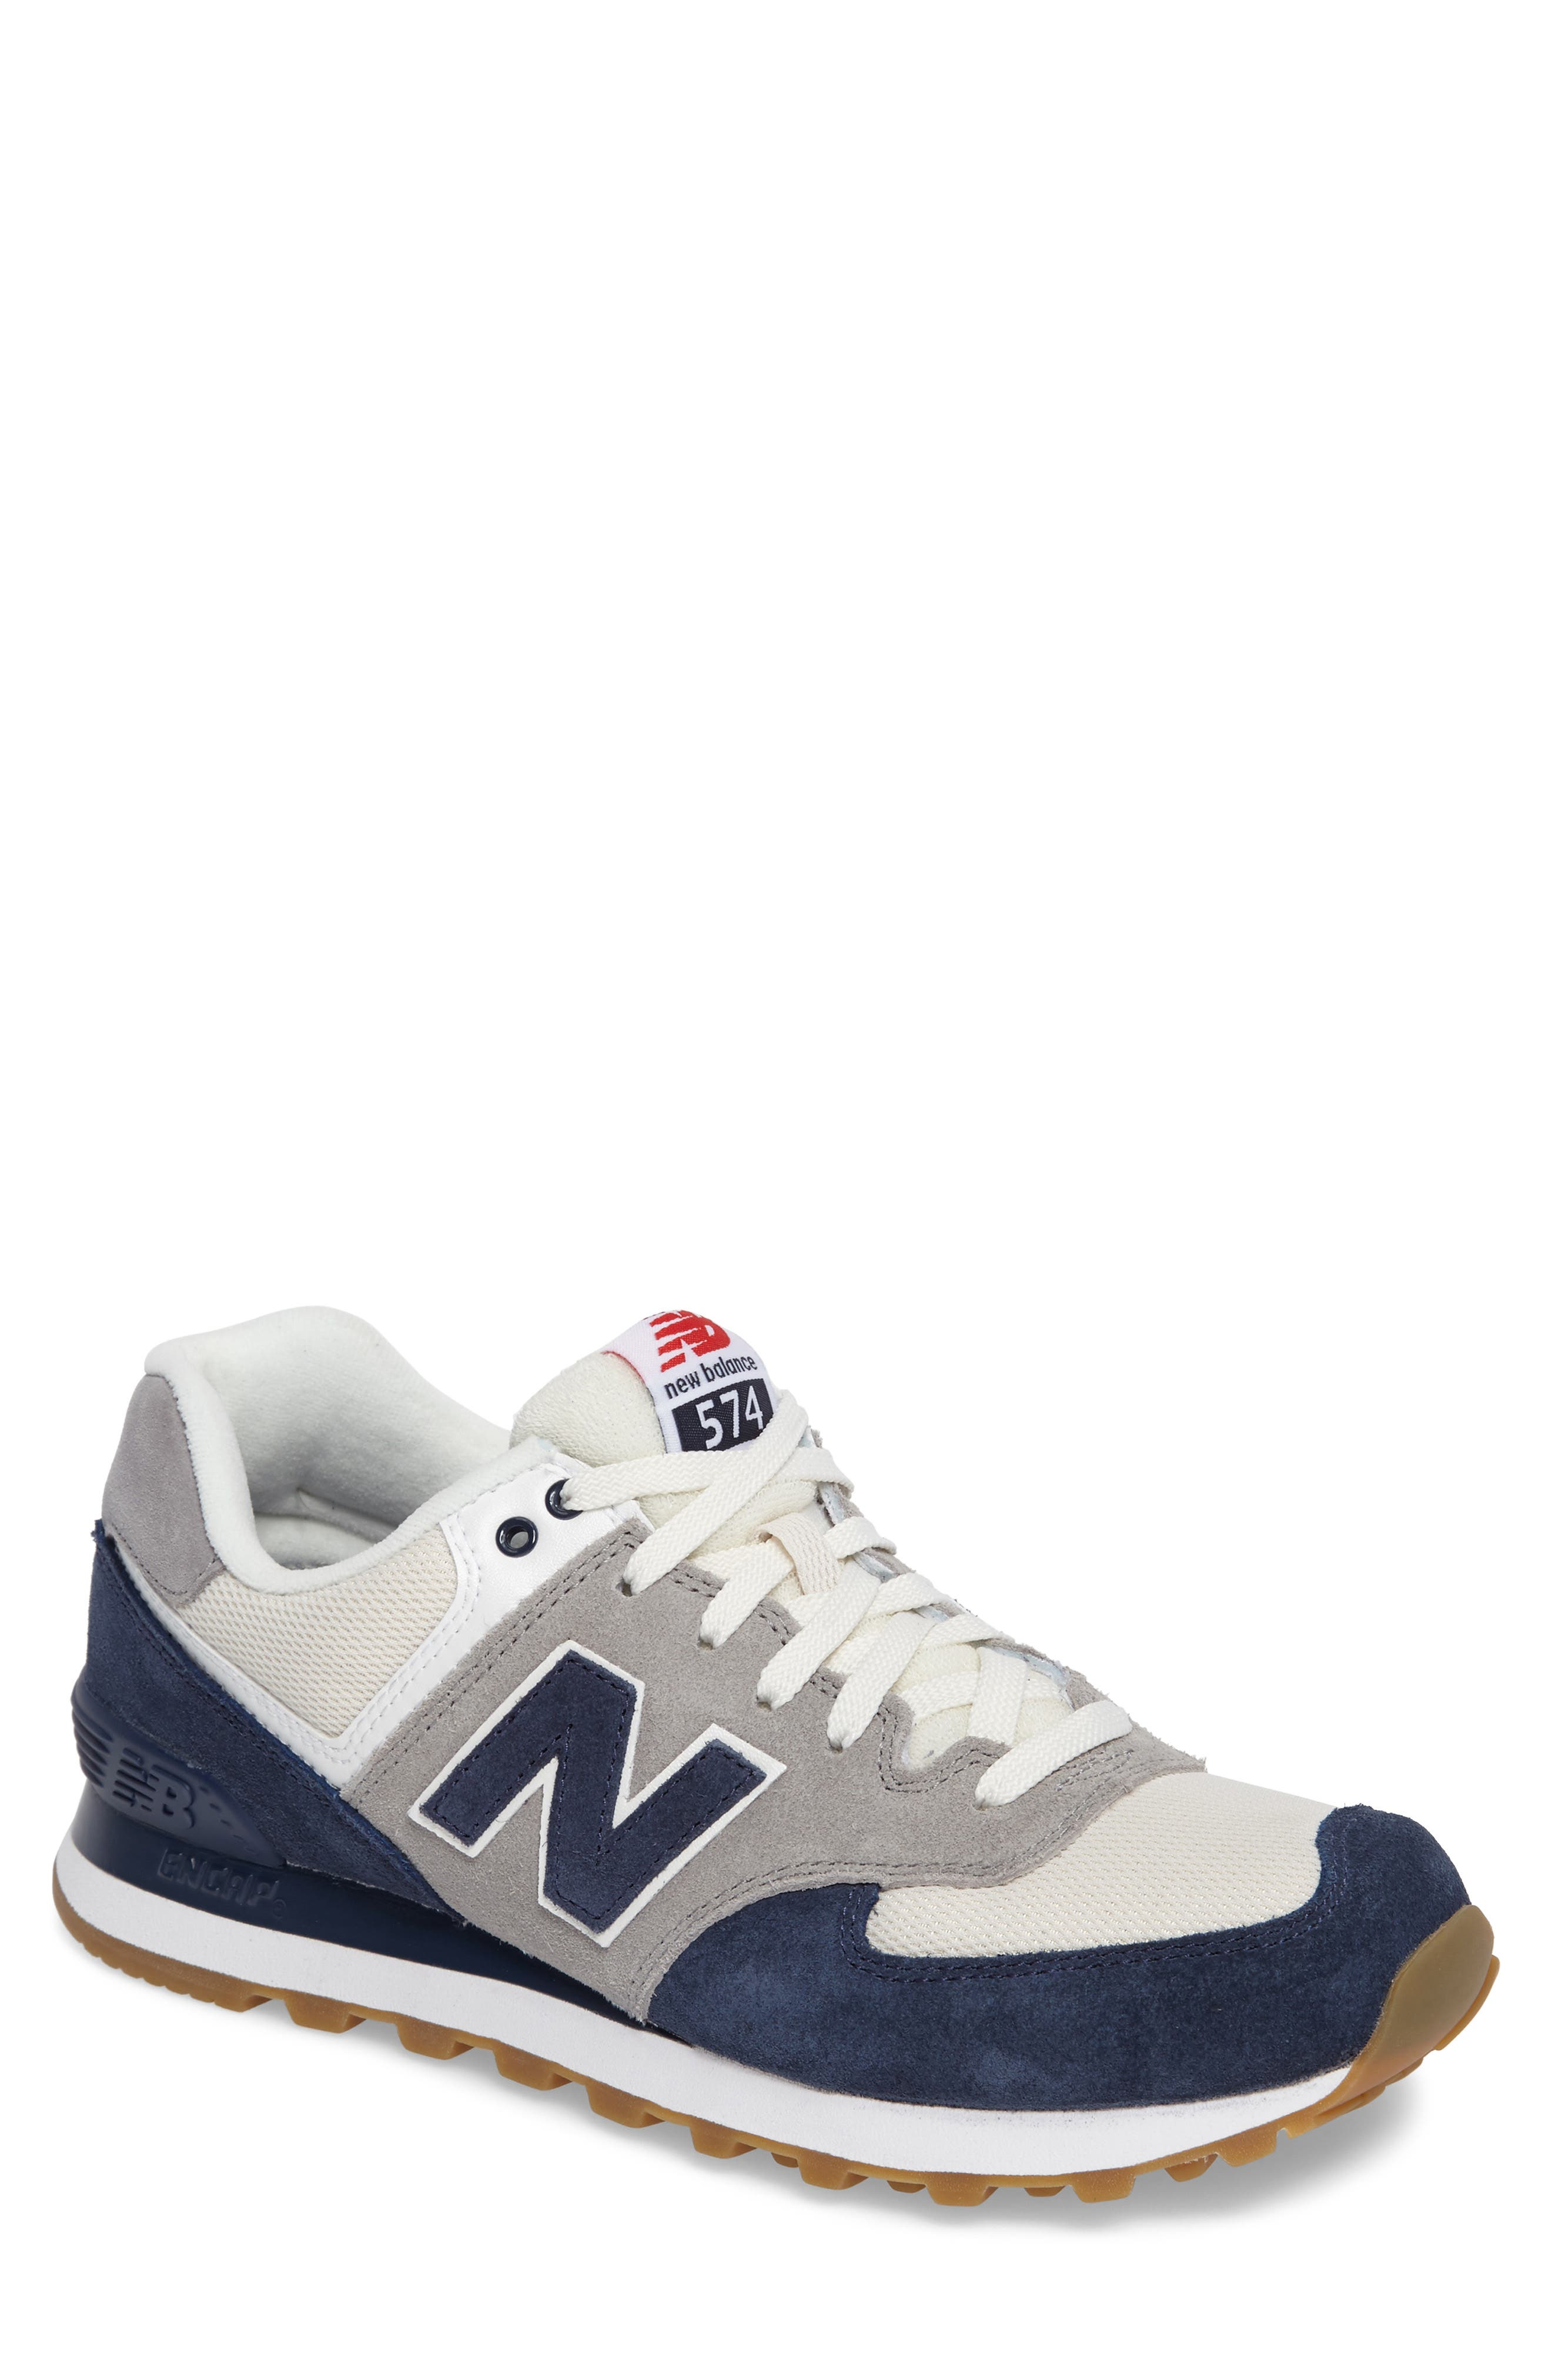 New Balance 574 Retro Sport Sneaker (Men)